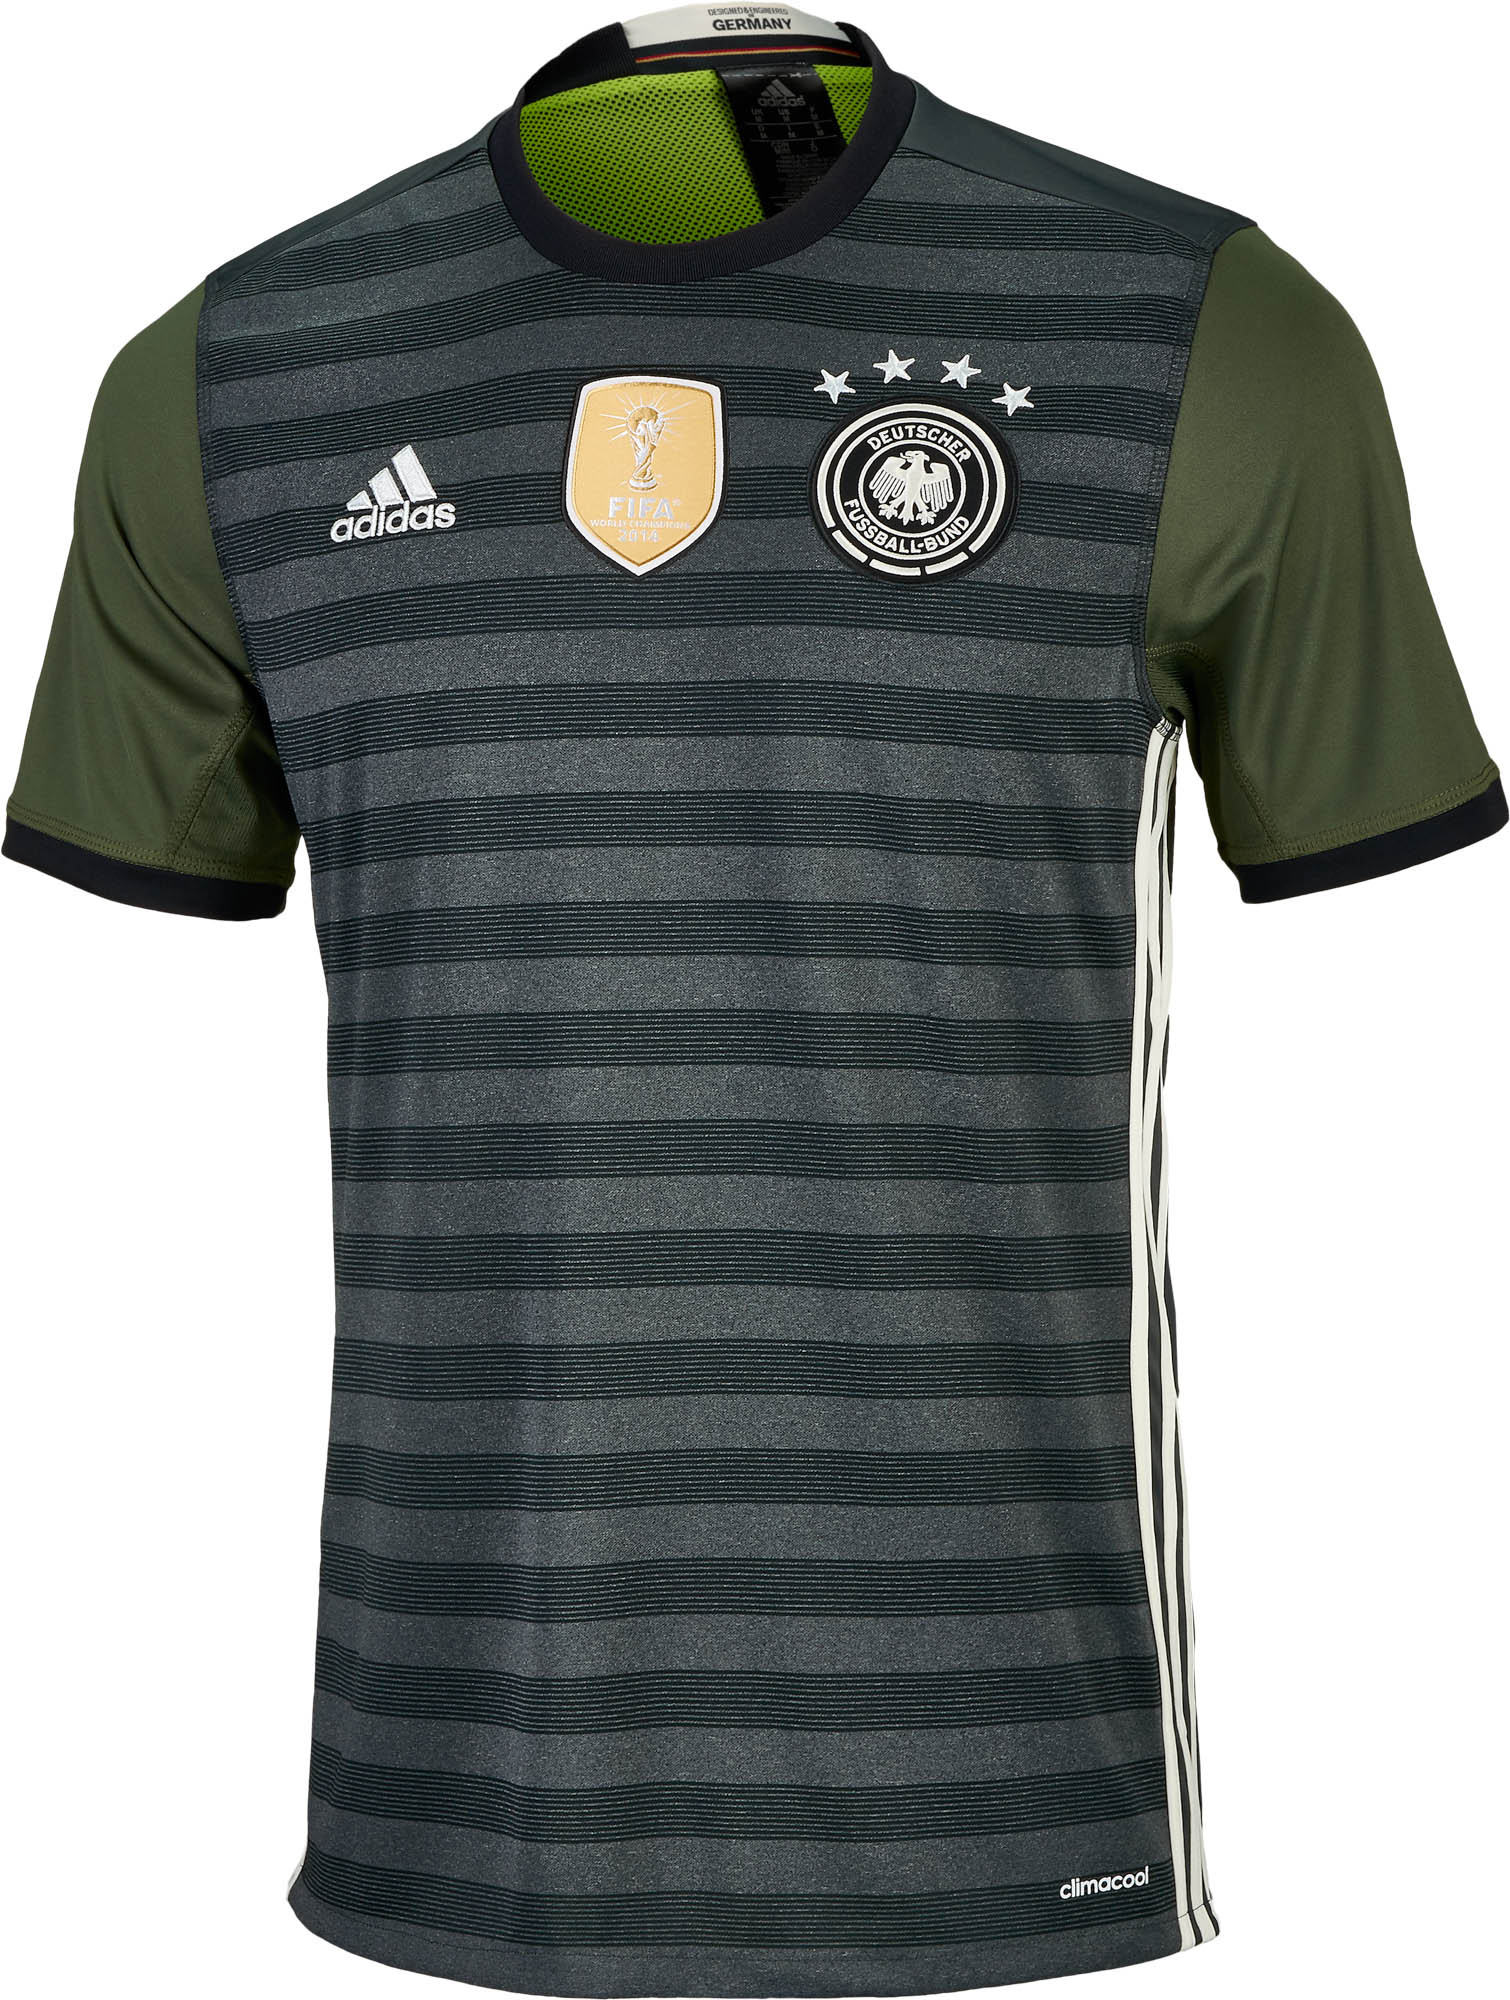 d9ddcd448a2 adidas Germany Away Jersey - 2016 Germany Soccer Jerseys